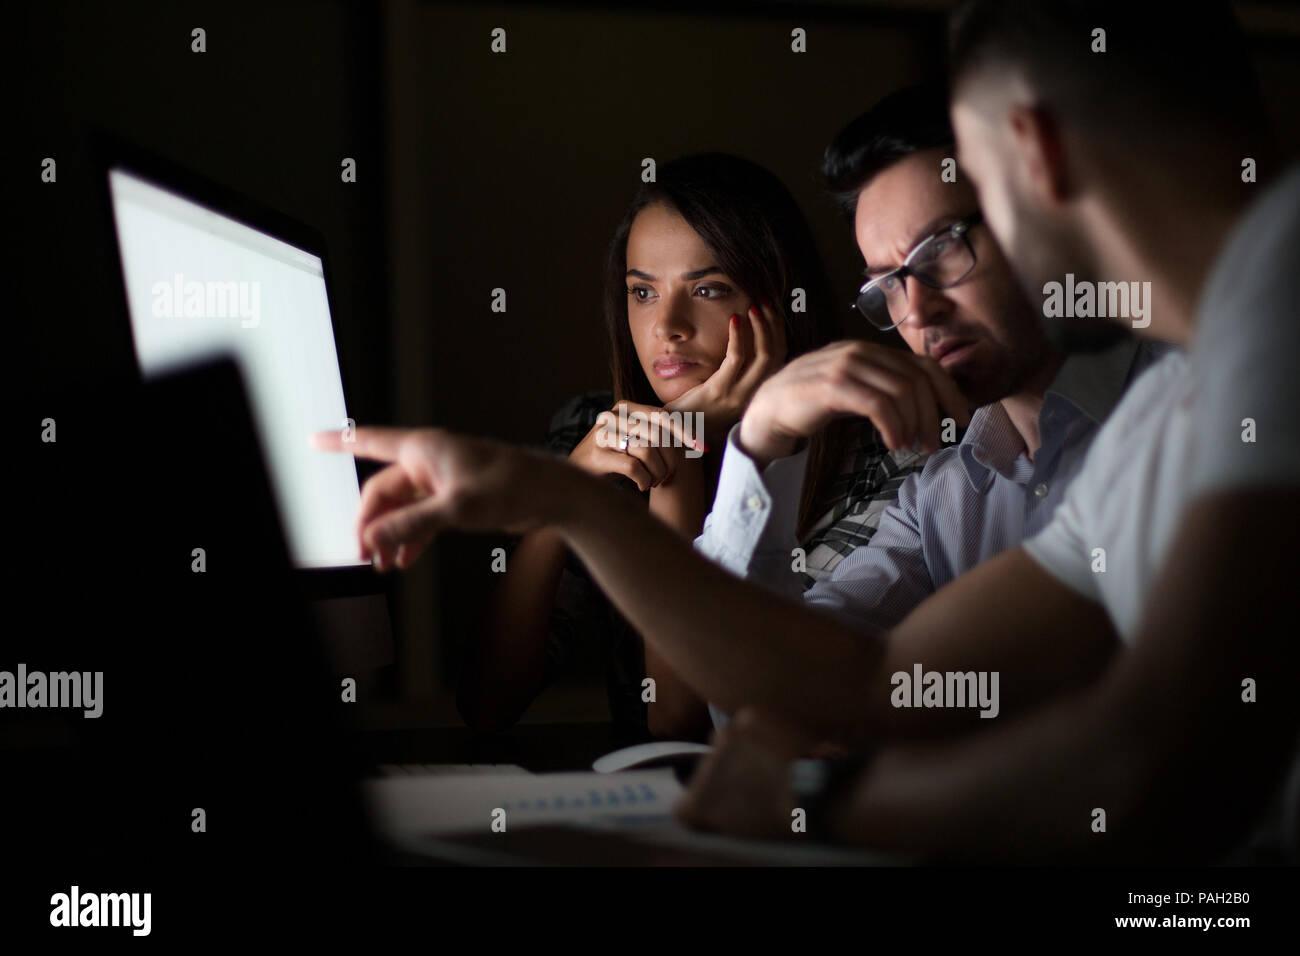 I dipendenti a discutere di problemi aziendali Immagini Stock